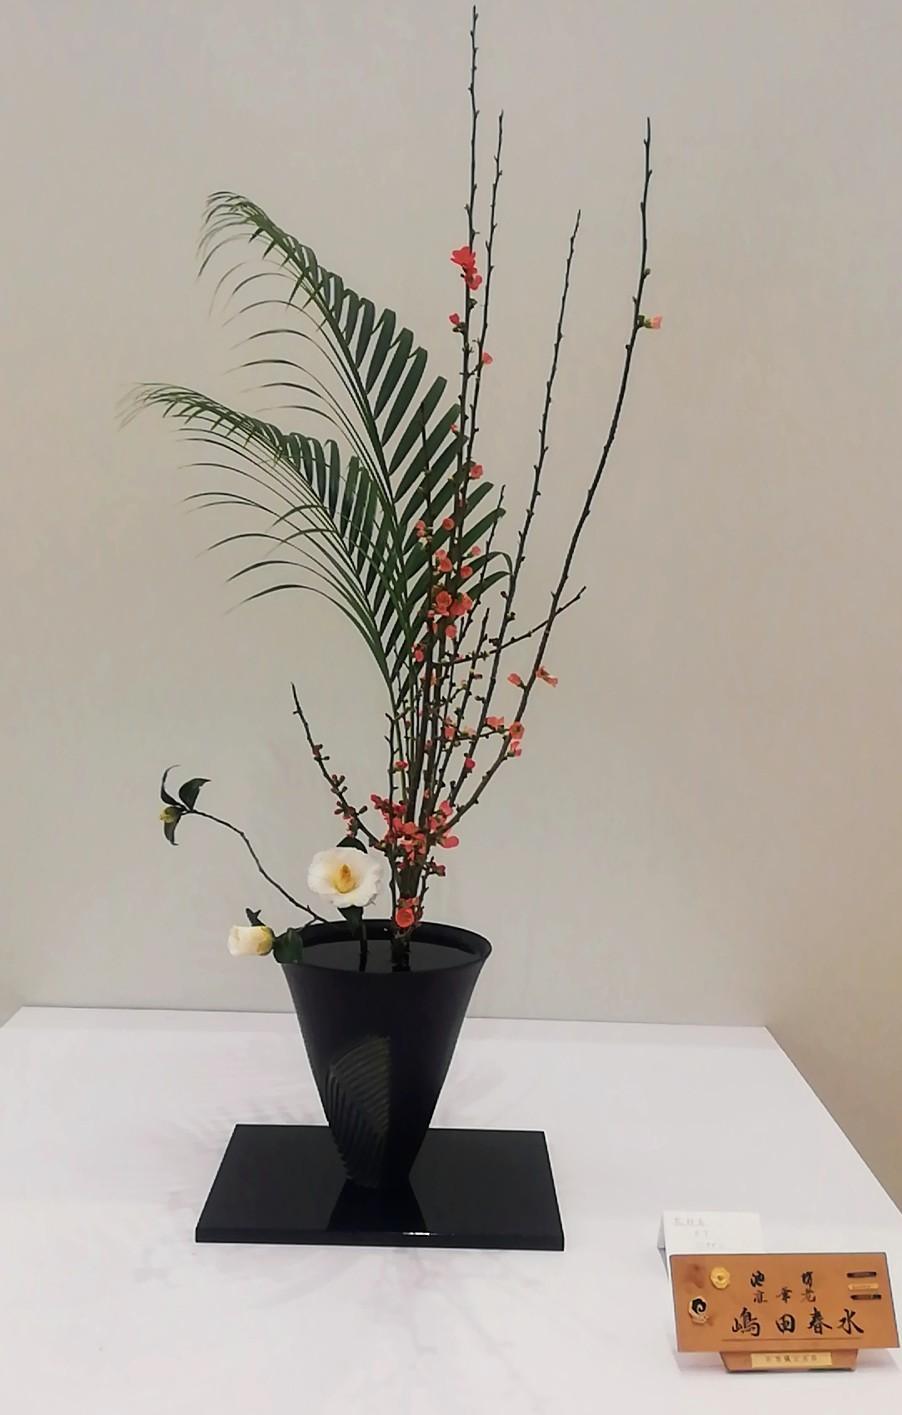 池坊佐賀県連合支部創立100周年記念いけばな池坊展 前期_d0195183_00130125.jpg